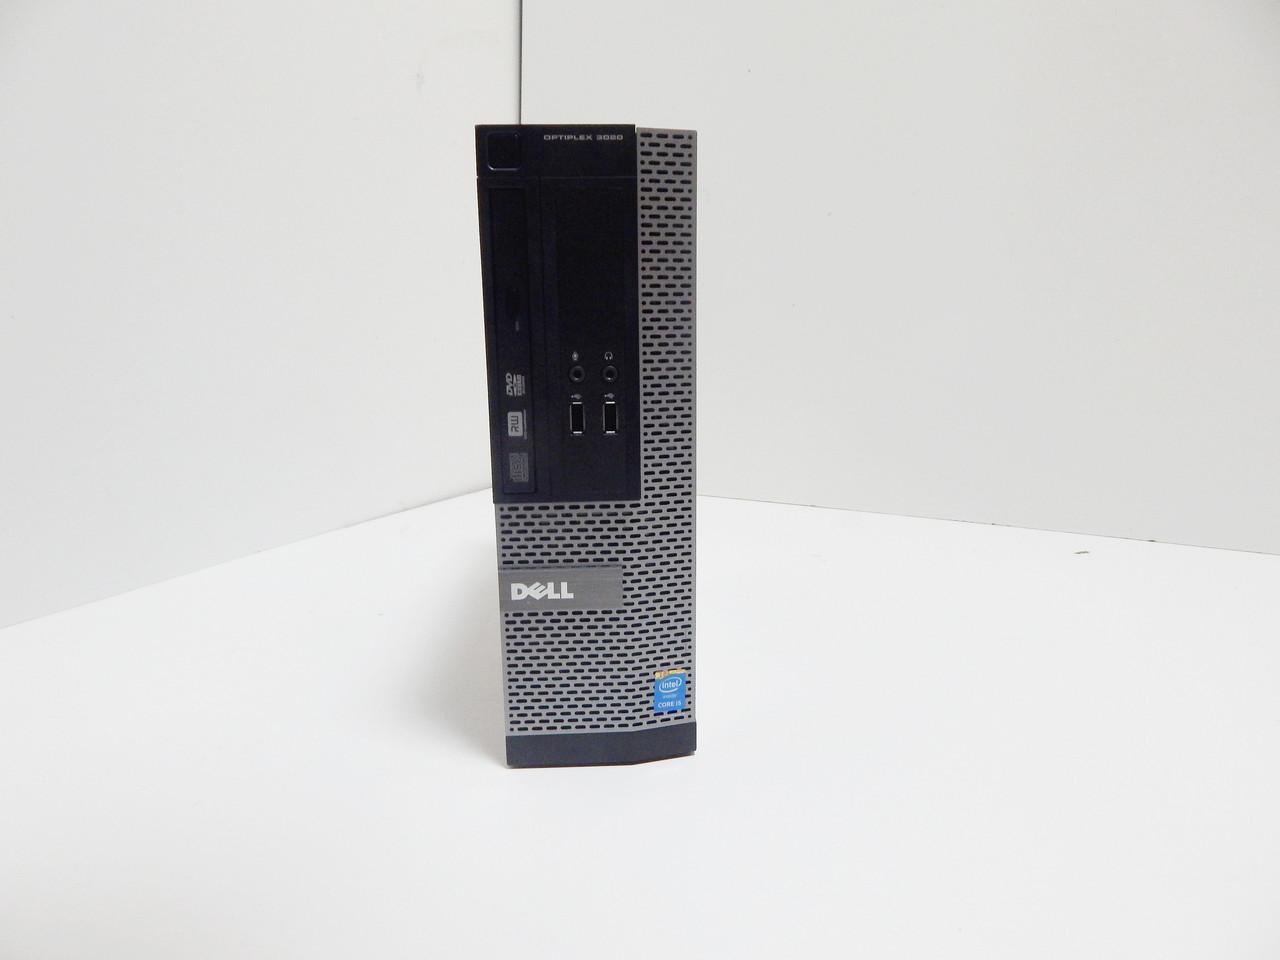 Системный блок  Dell OptiPlex 3020 i5-4590 (3,70 GHz) S 1150  RAM 4 ГБ HD Graphics 4600